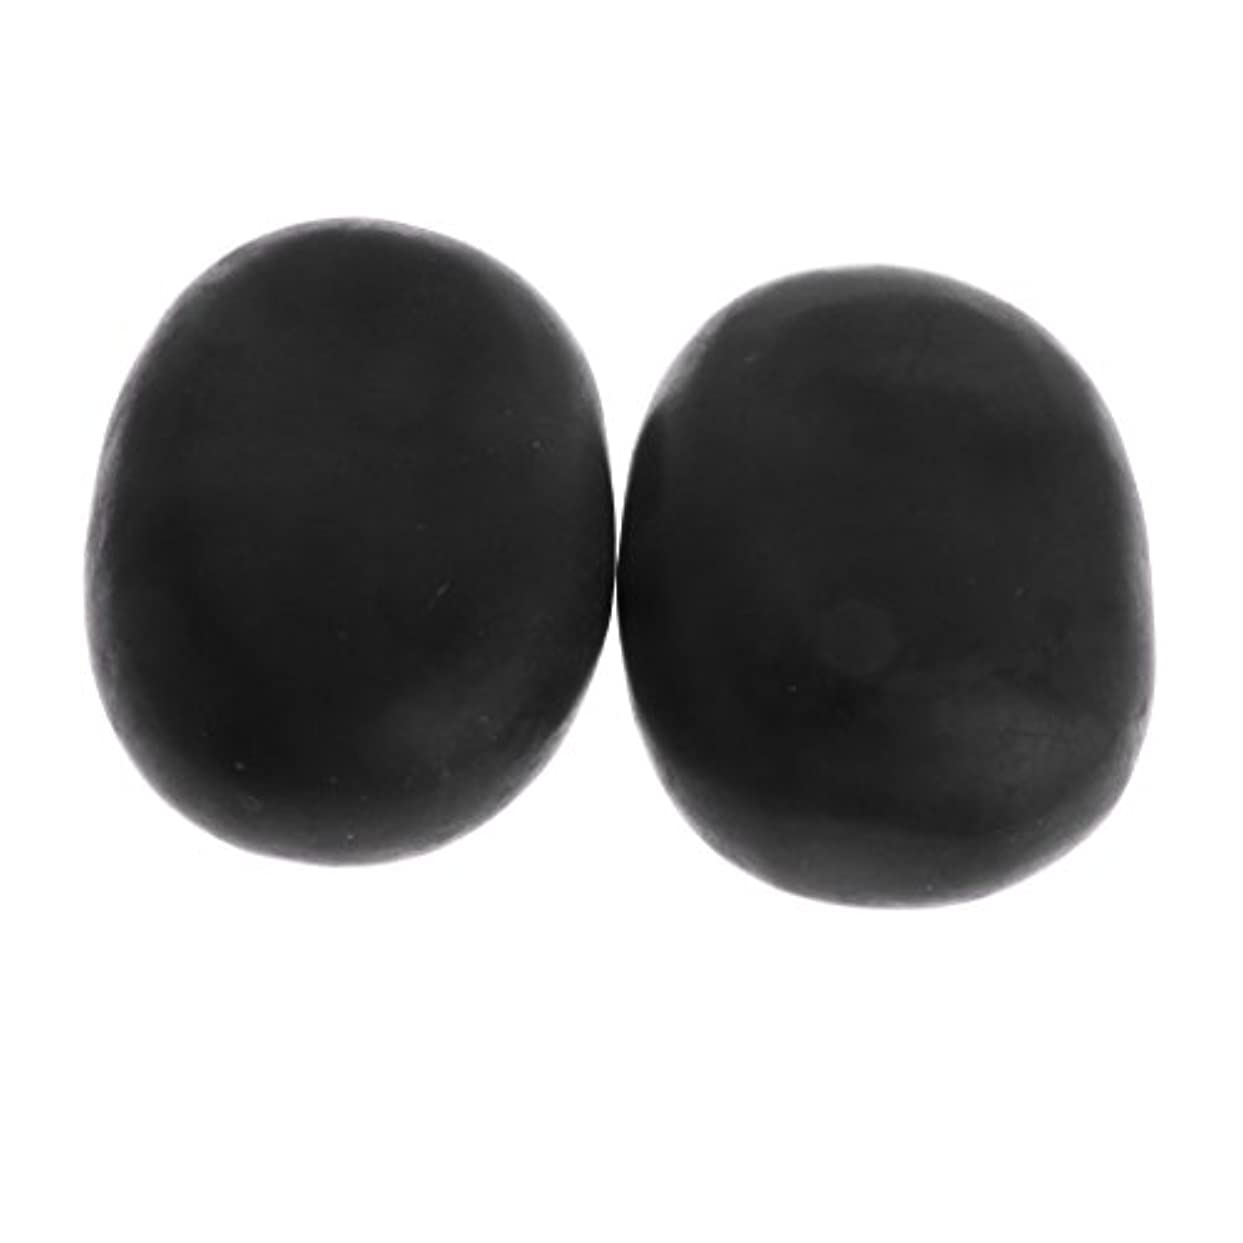 Kesoto マッサージ石 2個 温泉石 玄武岩 火山石 マッサージ 溶岩 自然石